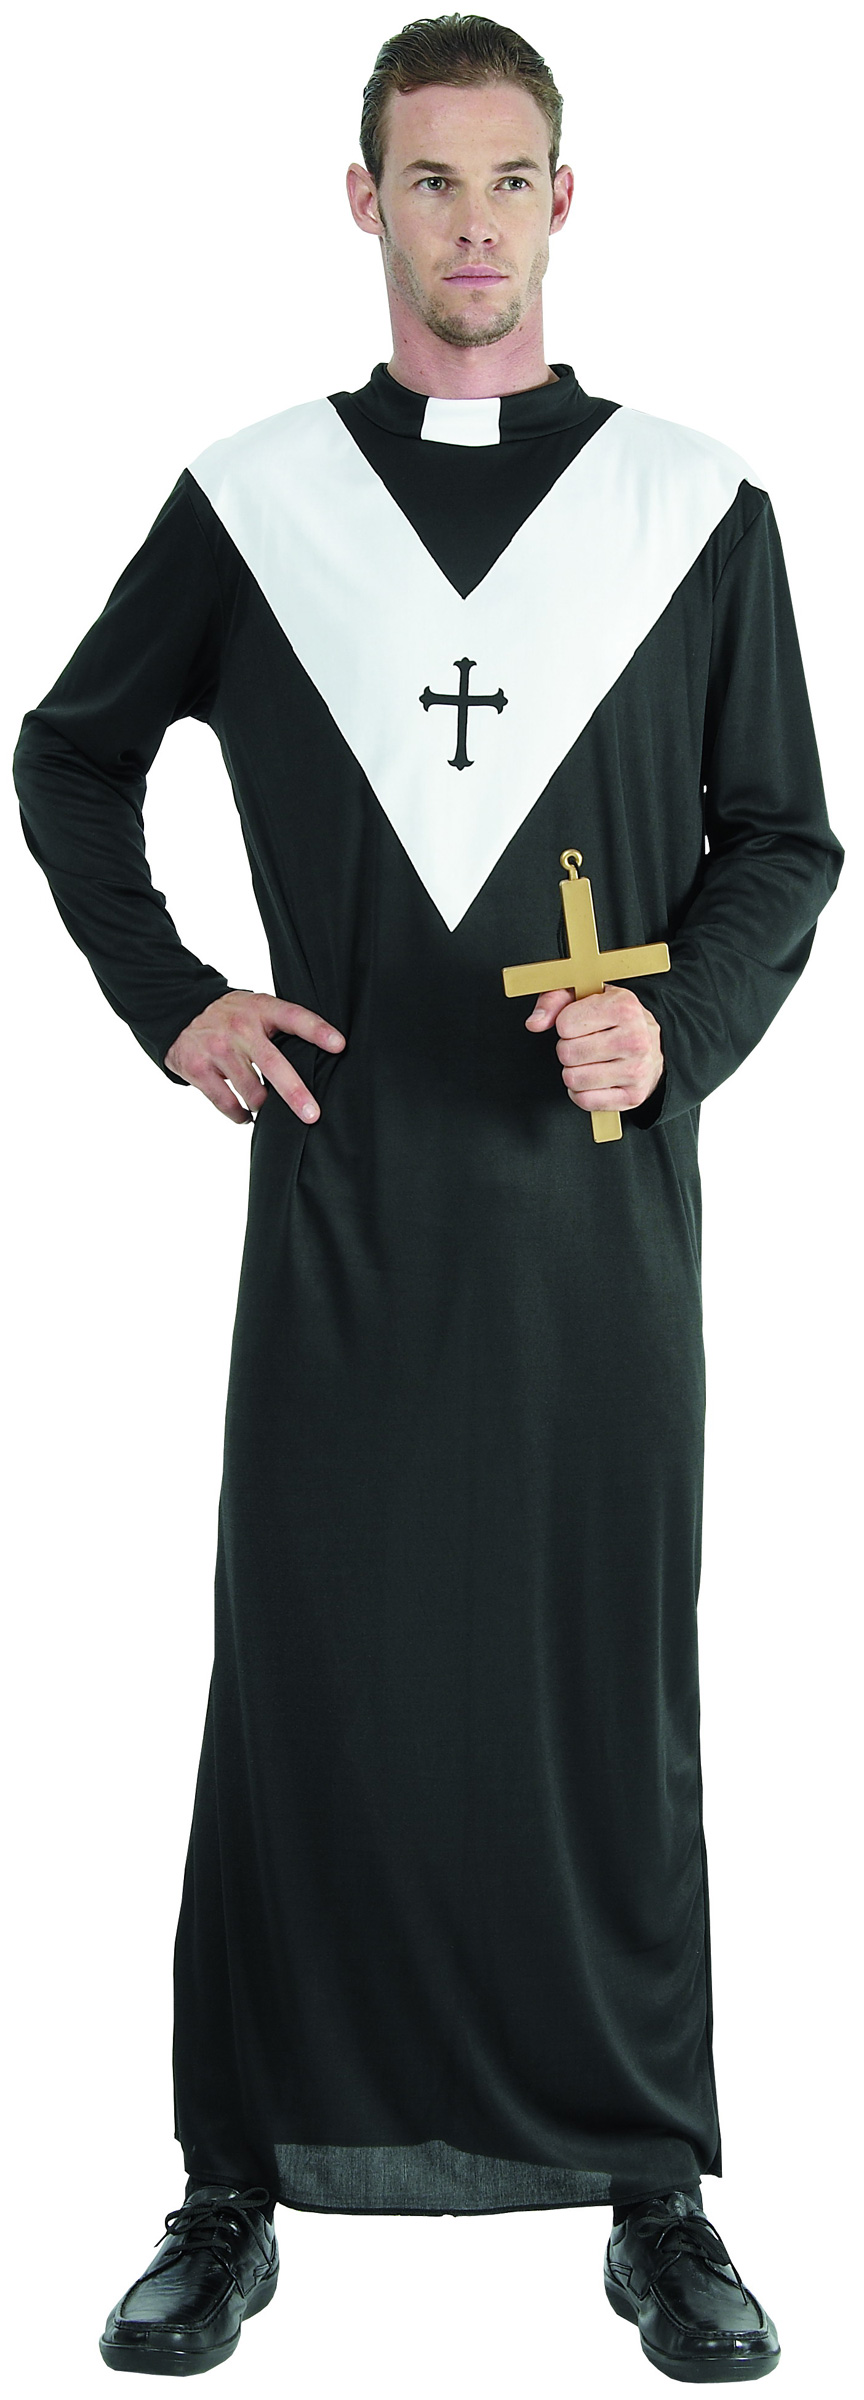 costume homme grande taille pas cher. Black Bedroom Furniture Sets. Home Design Ideas